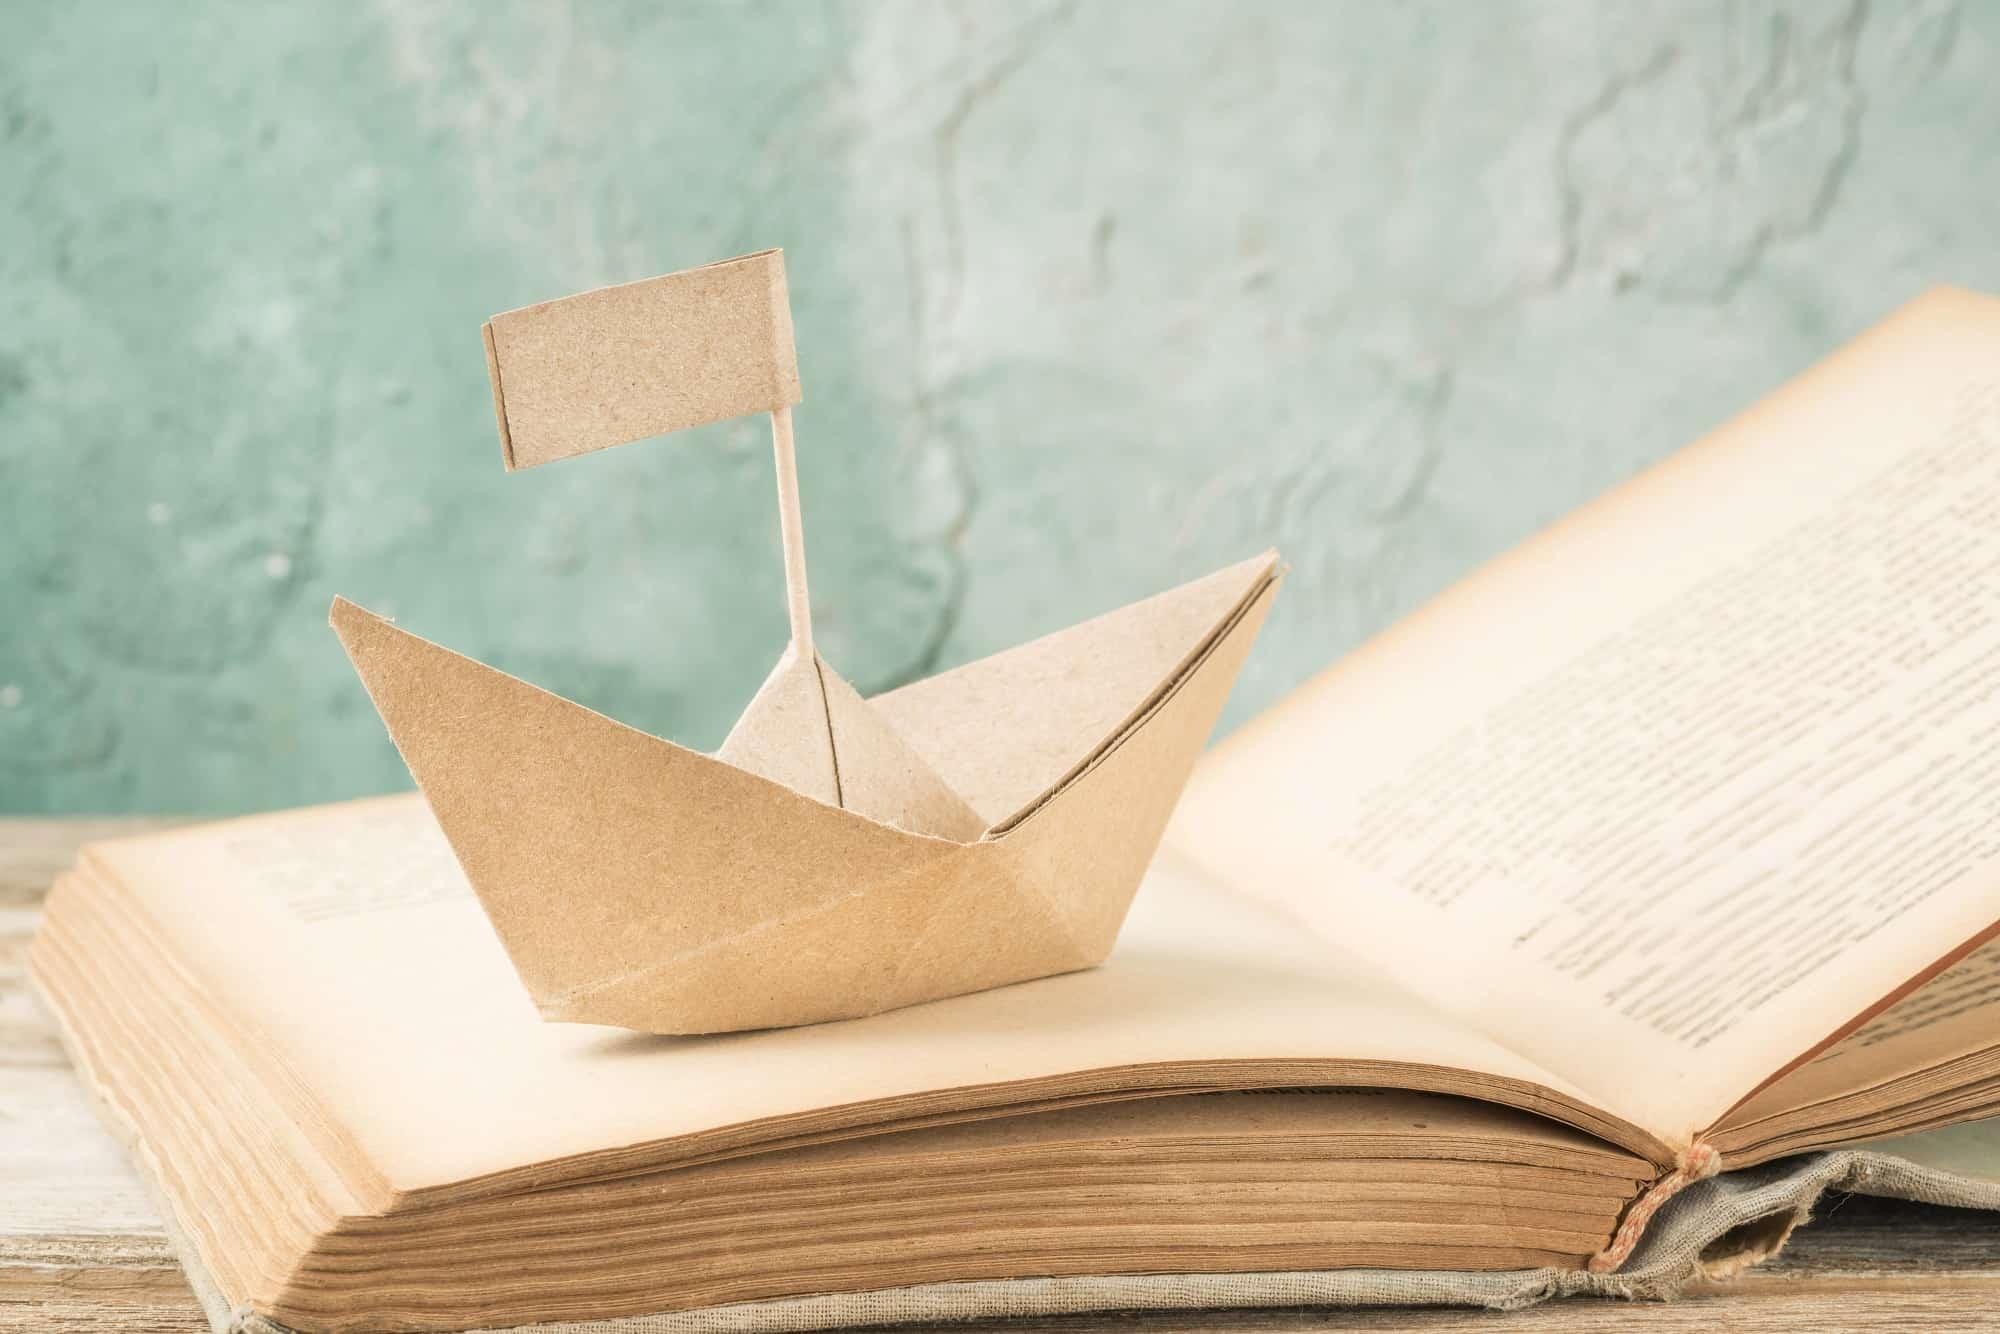 Buchautor an Bord